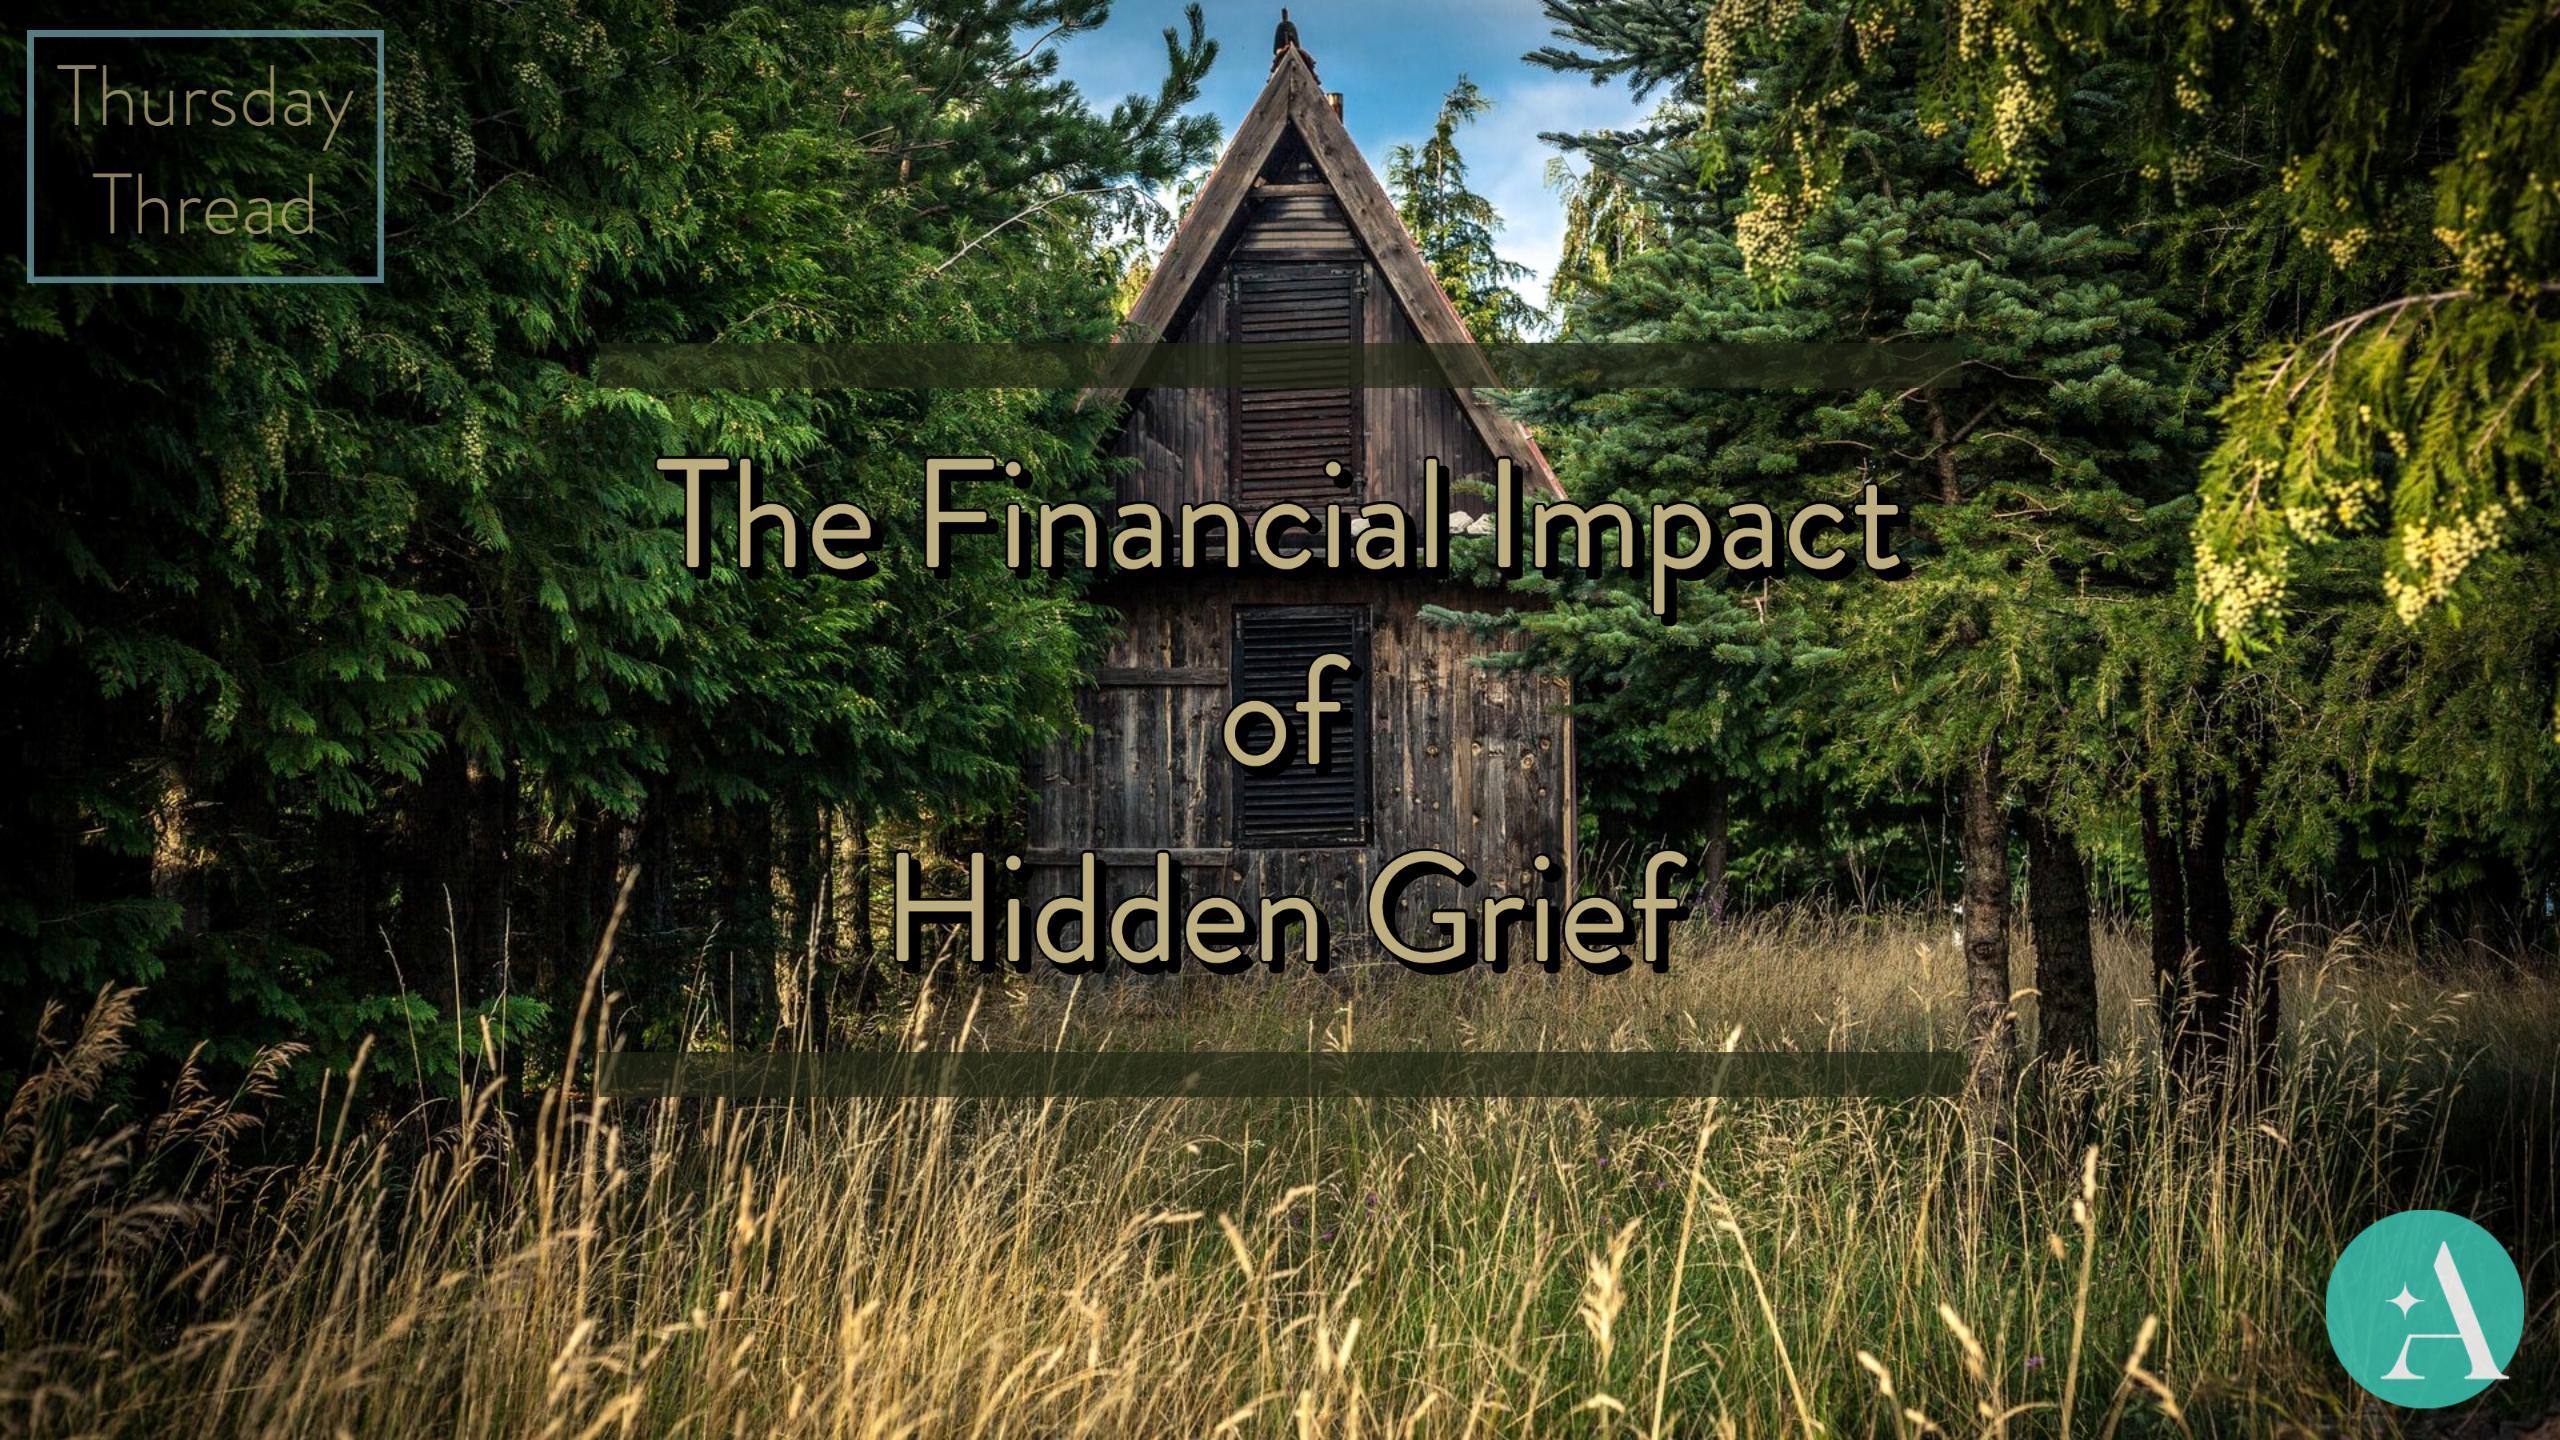 Thursday Thread: The Financial Impact of Hidden Grief Thumbnail